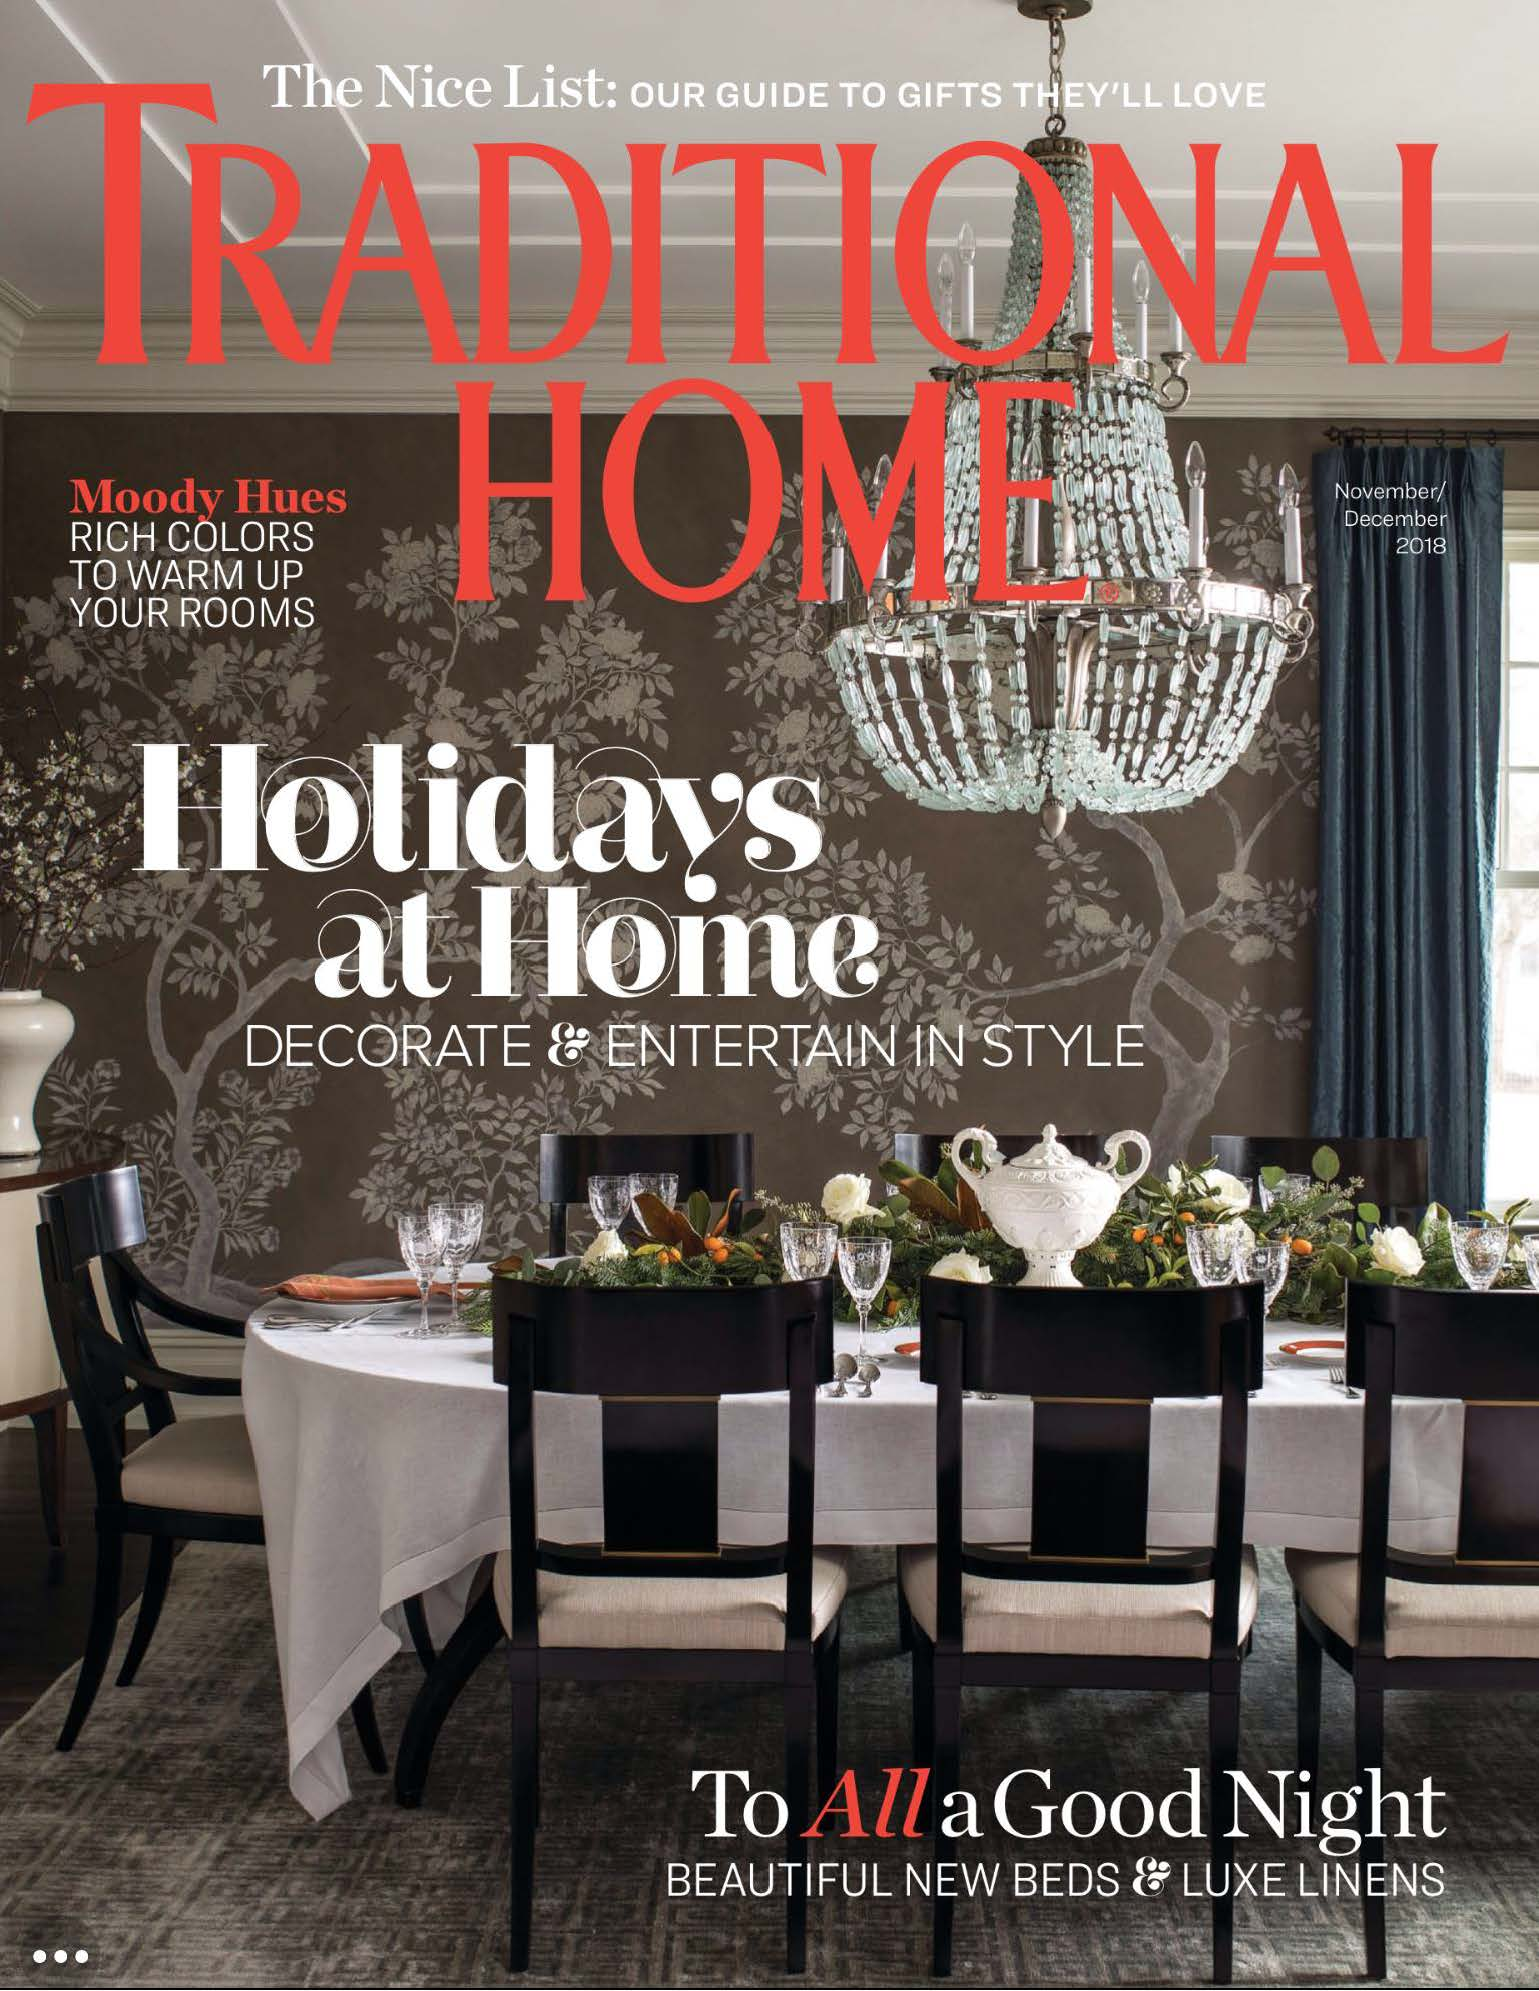 Traditional Home - November.December 2018_Page_01.jpg